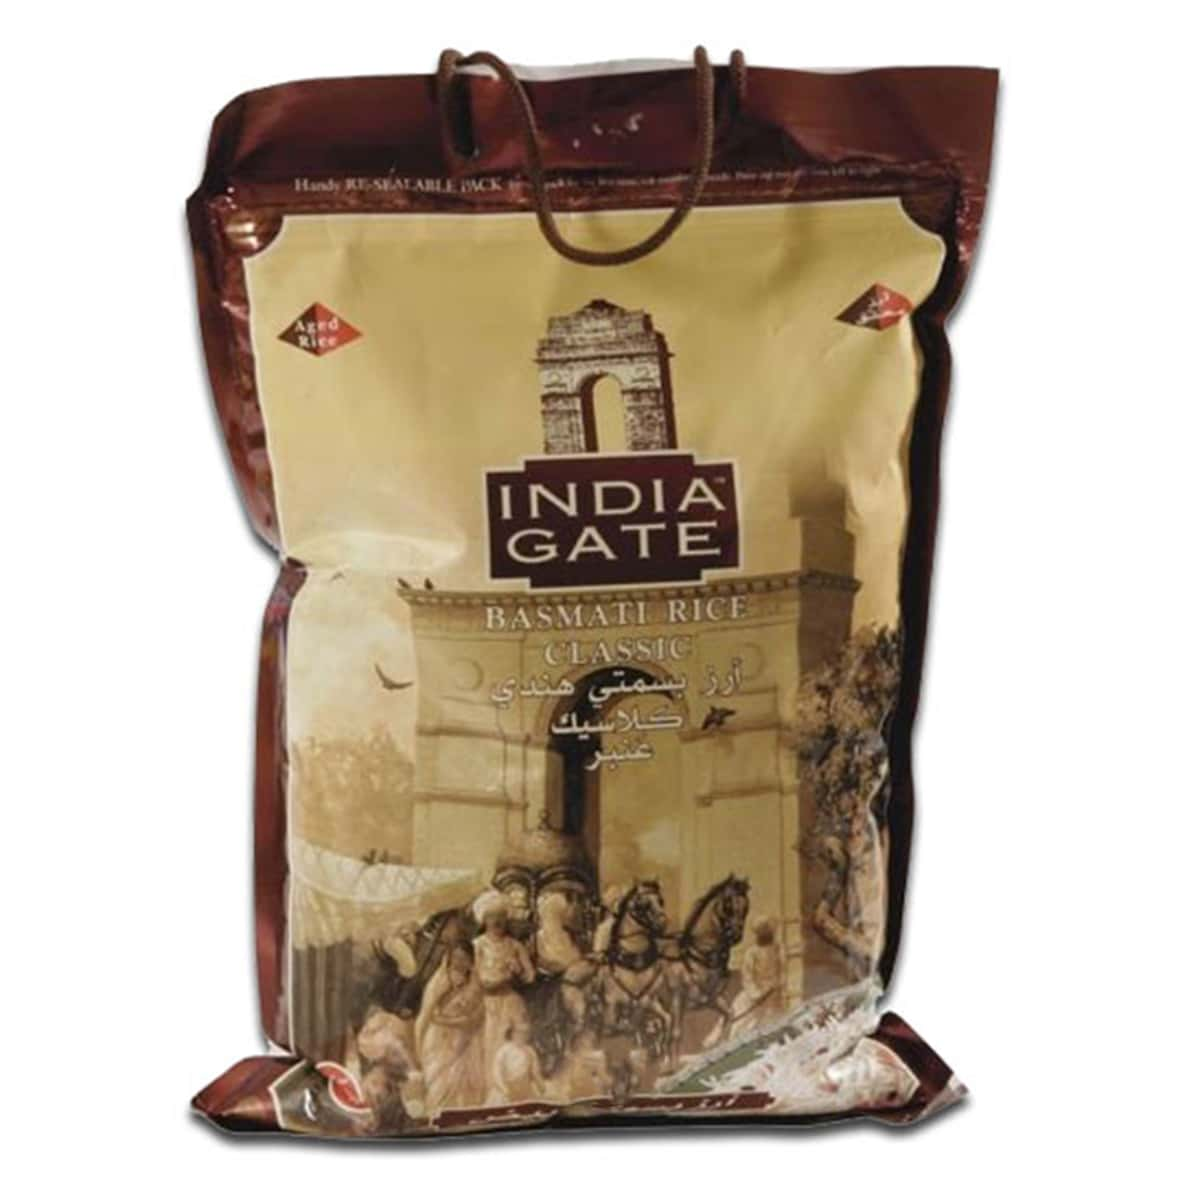 Buy India Gate Basmati Rice Classic - 1 kg